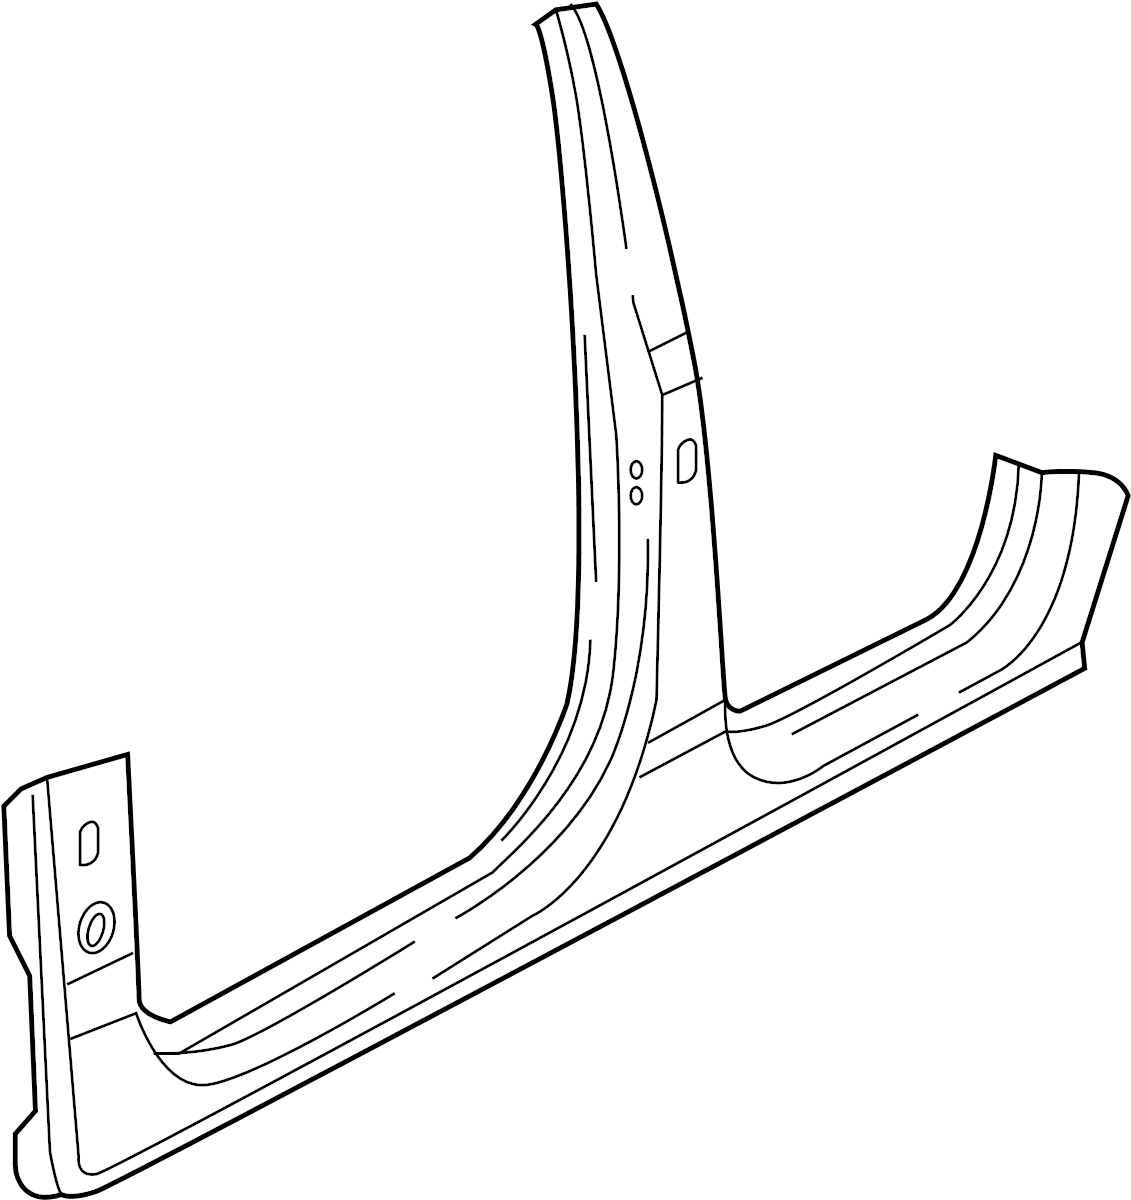 Audi Q7 Body B Pillar And Rocker Panel Lower